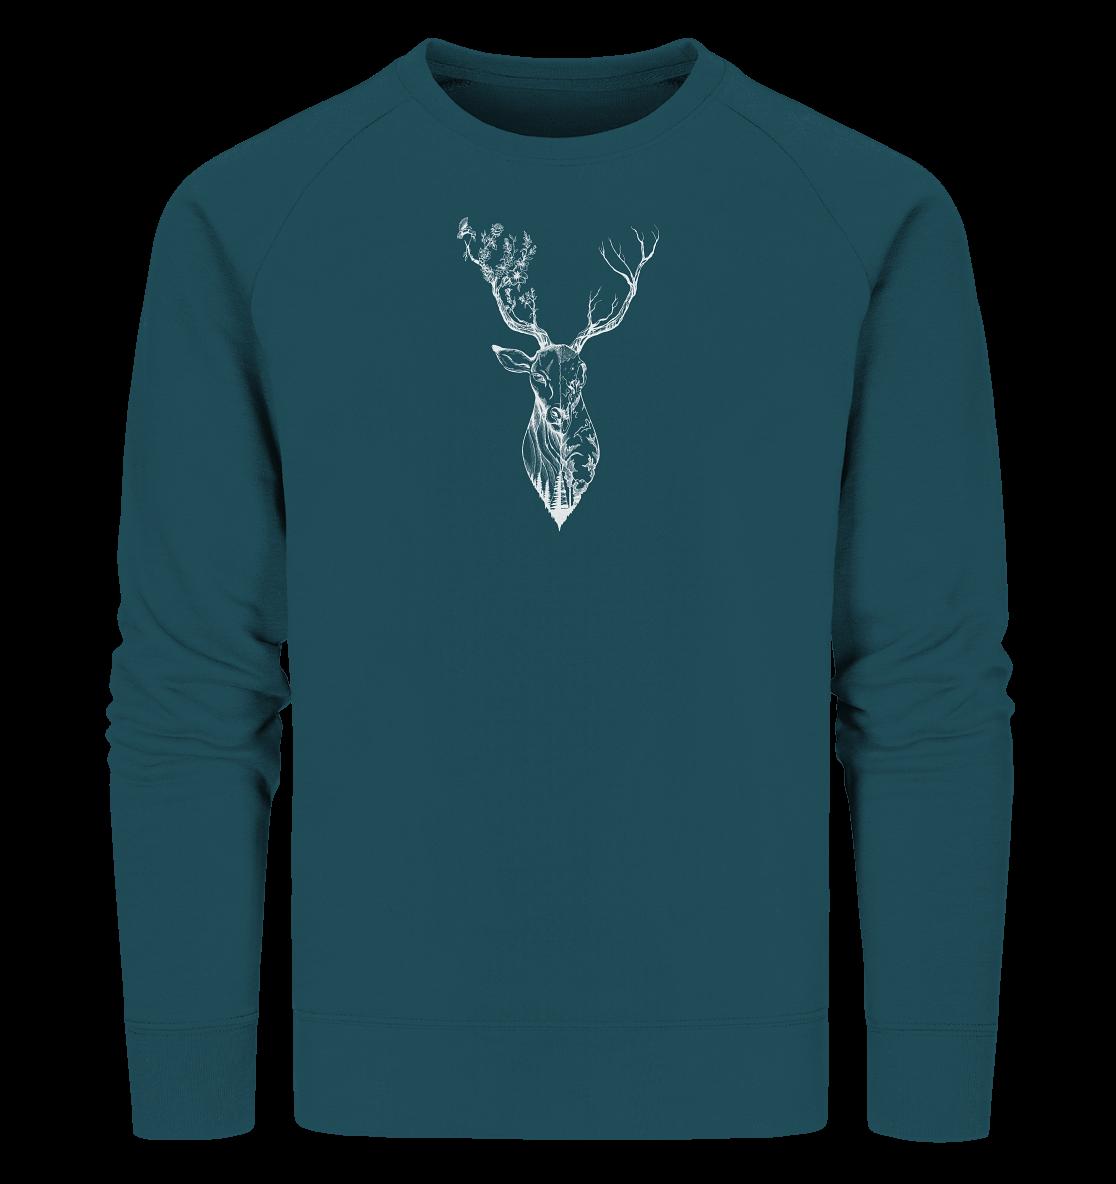 front-organic-sweatshirt-204d59-1116x-5.png